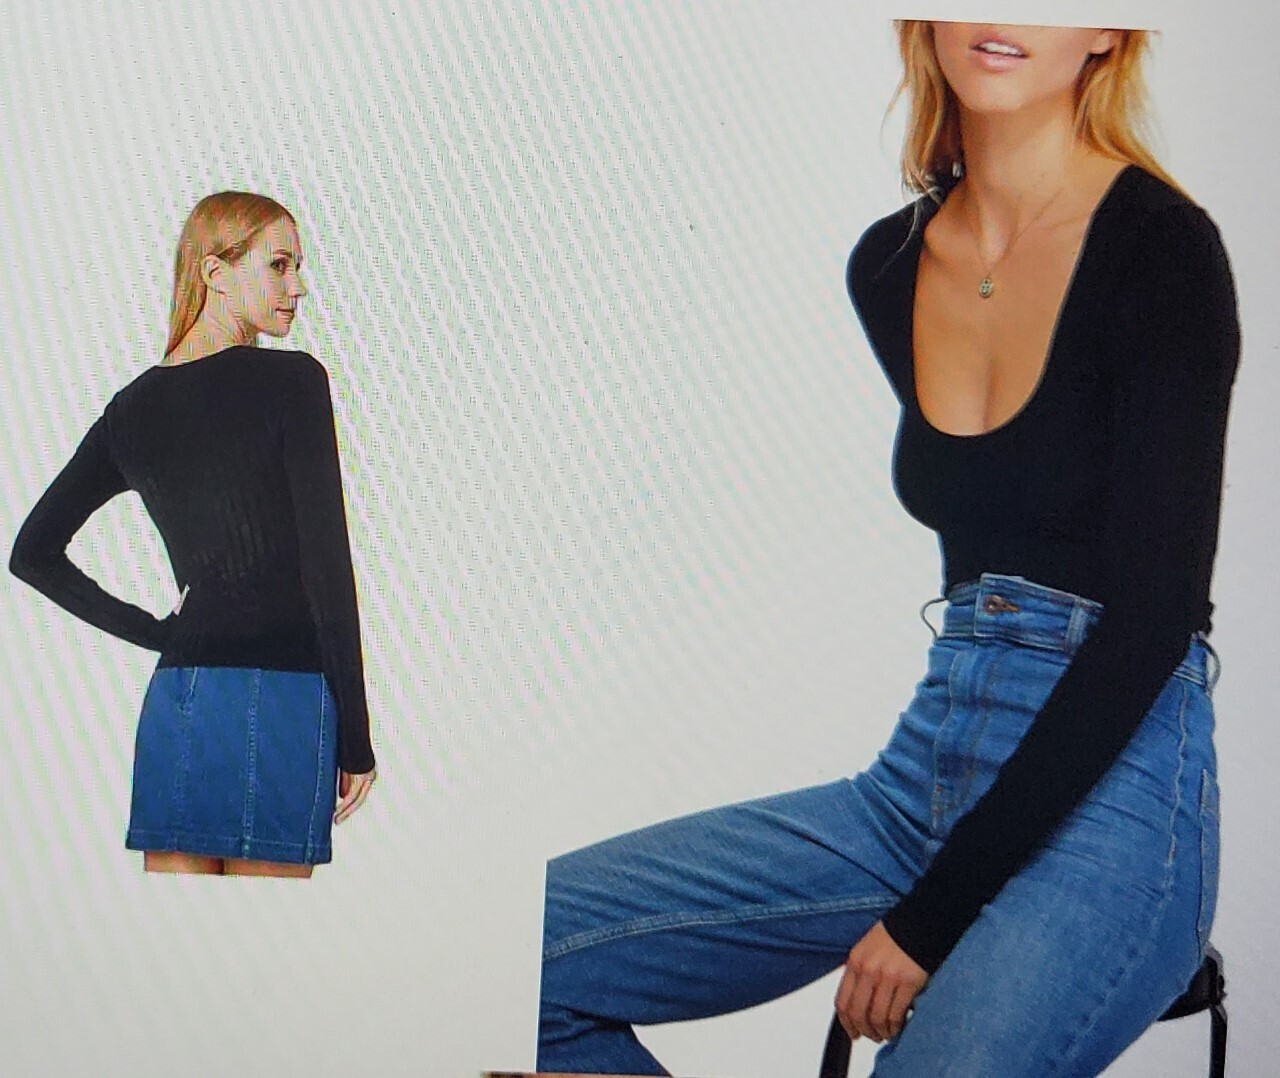 Free People Scoop Neck (Retail $48) Size XS